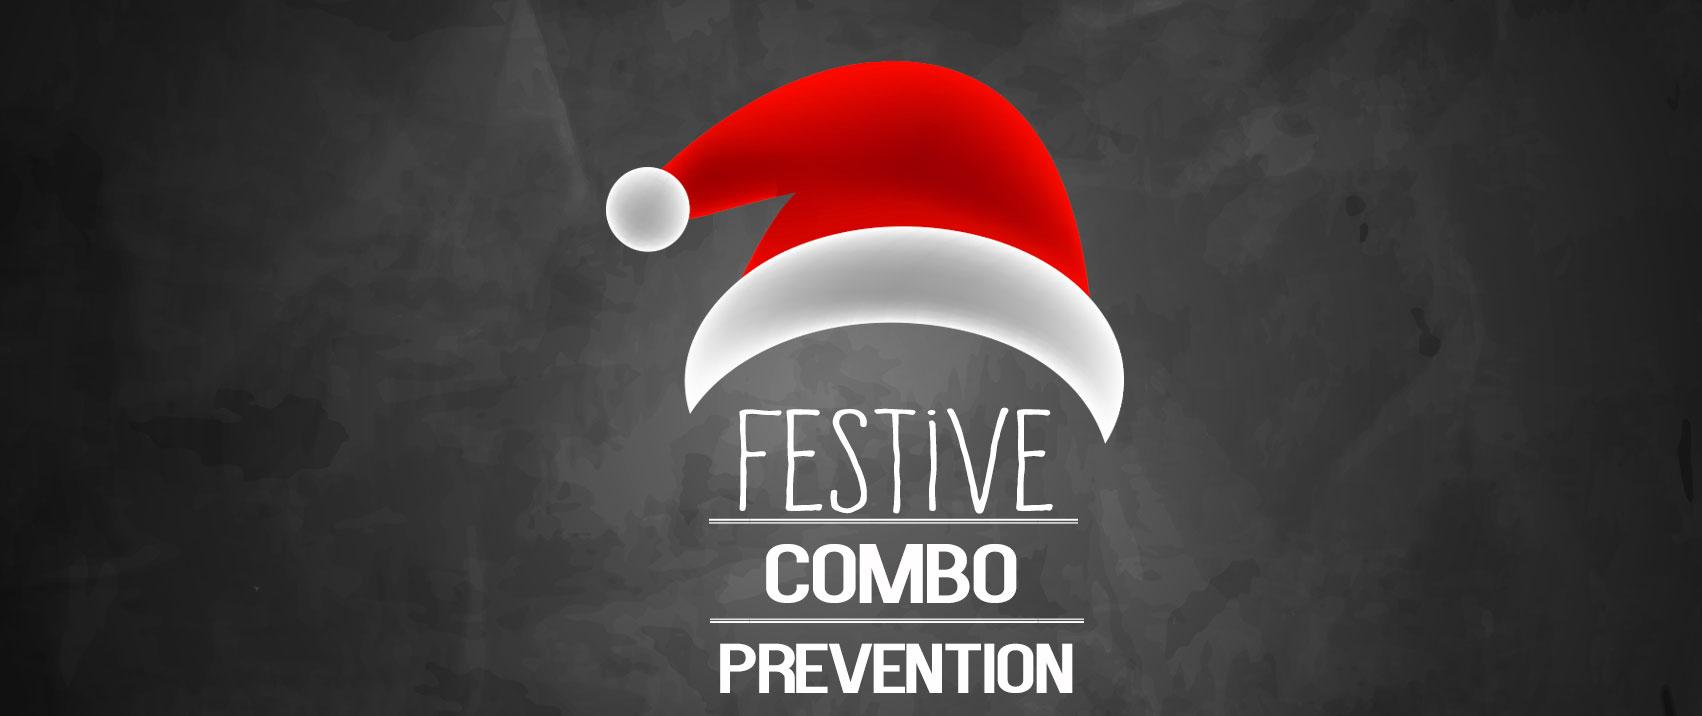 Festive Combo Prevention